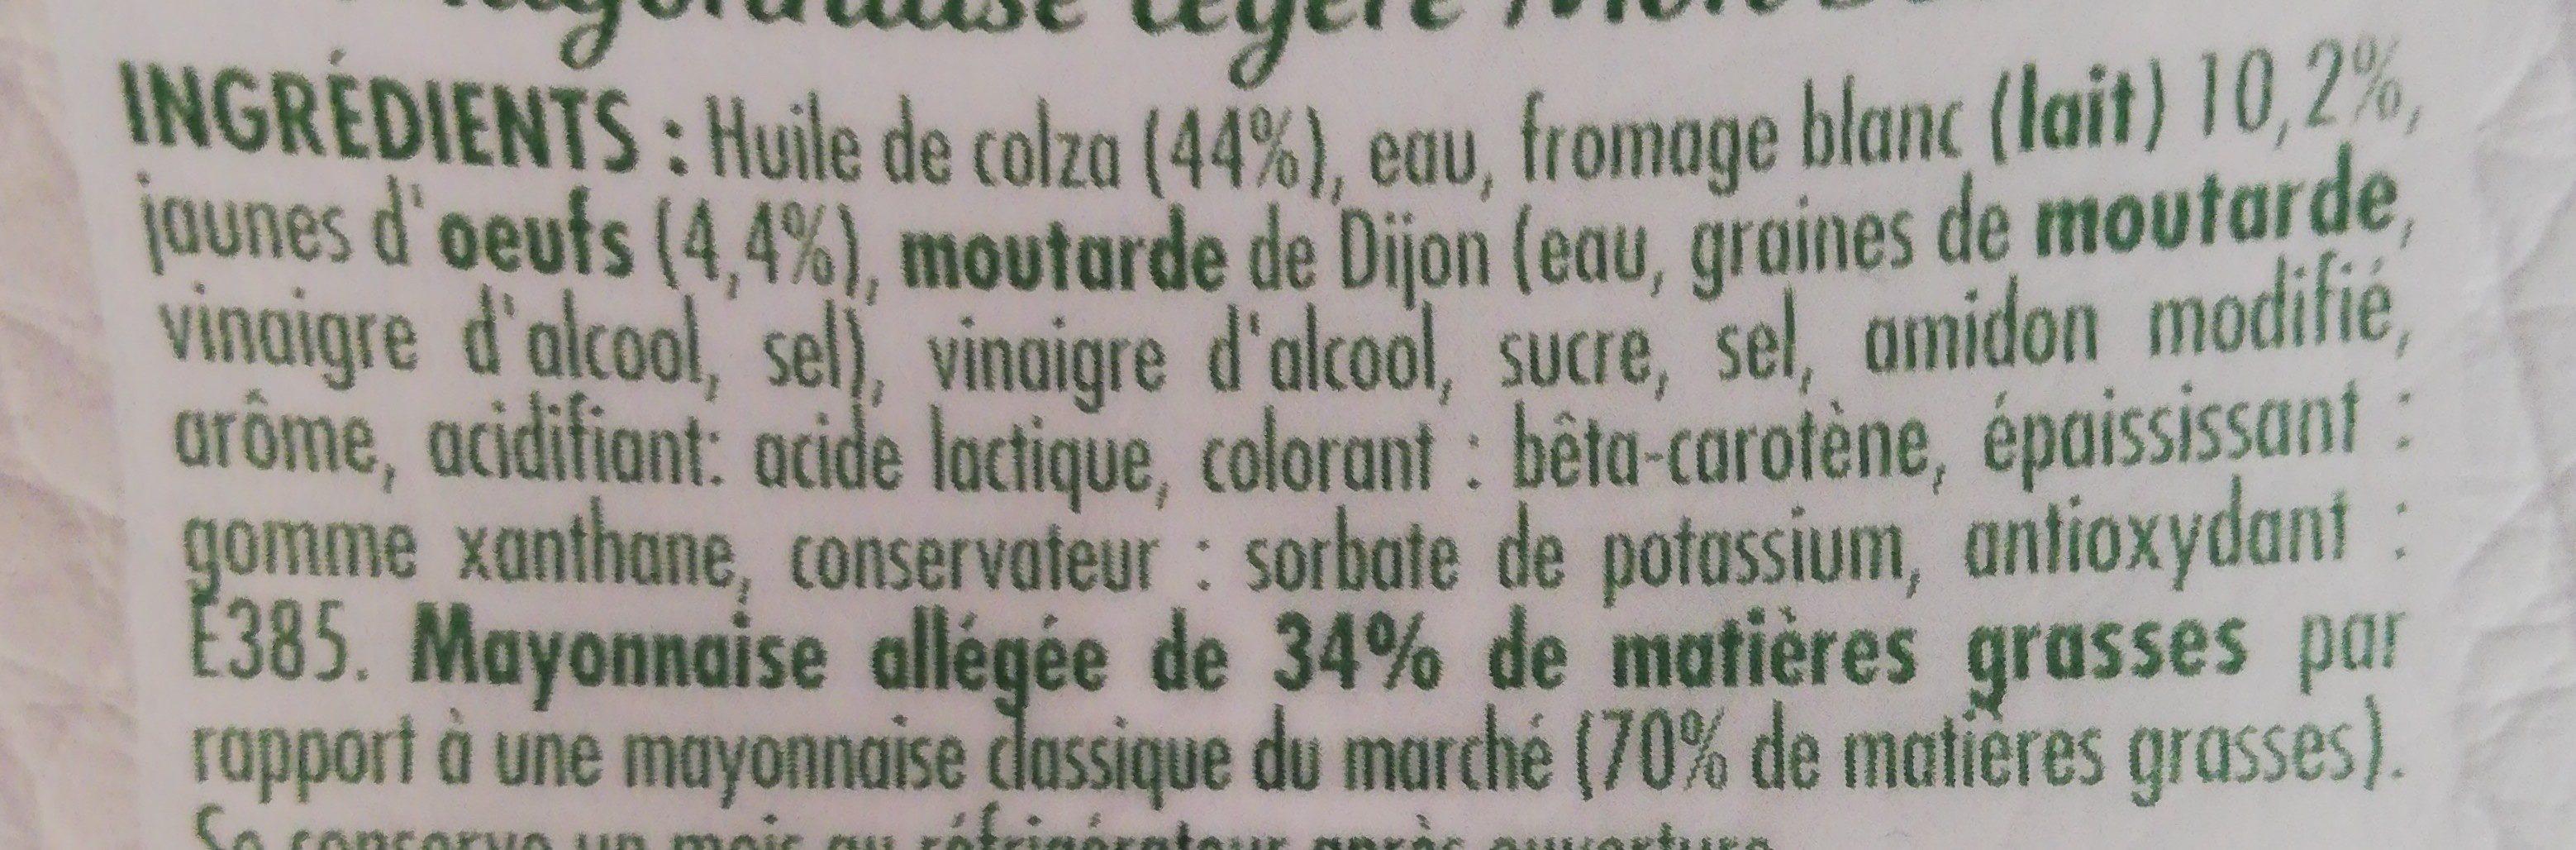 Bénédicta Mon Secret - Ingrediënten - fr